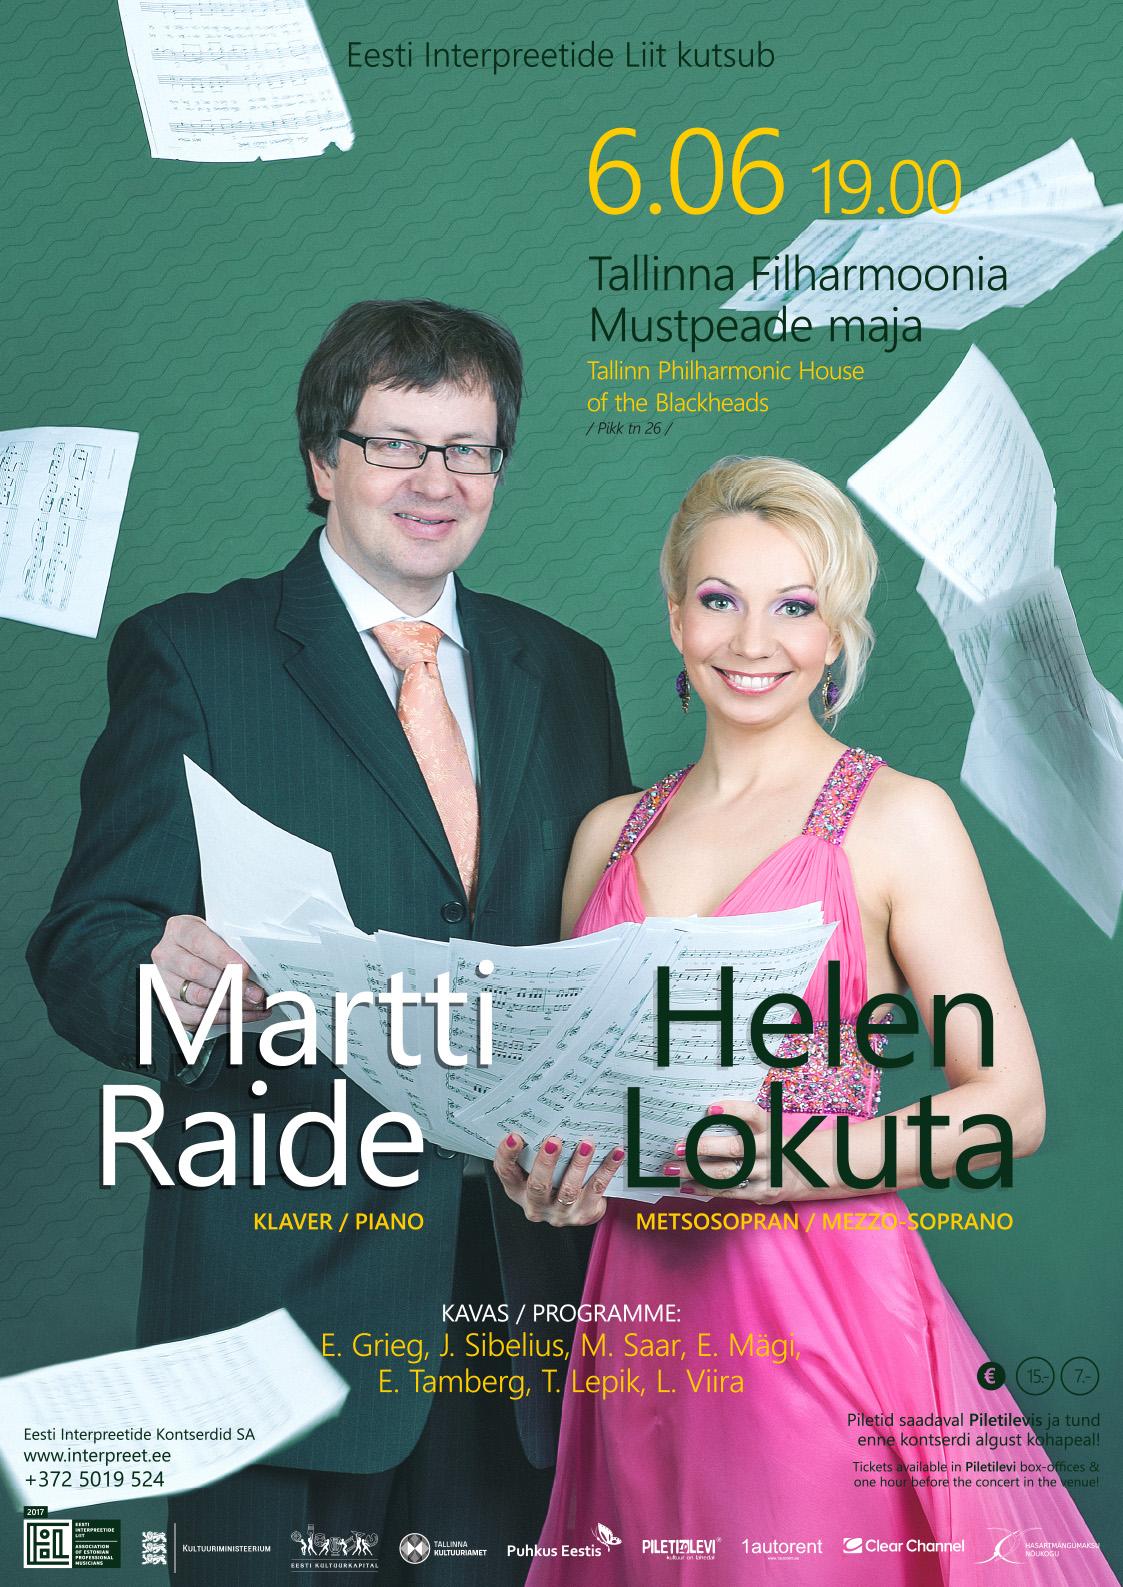 Eesti Interpreetide Liit kutsub: Helen Lokuta (metsosopran) ja Martti Raide (klaver)